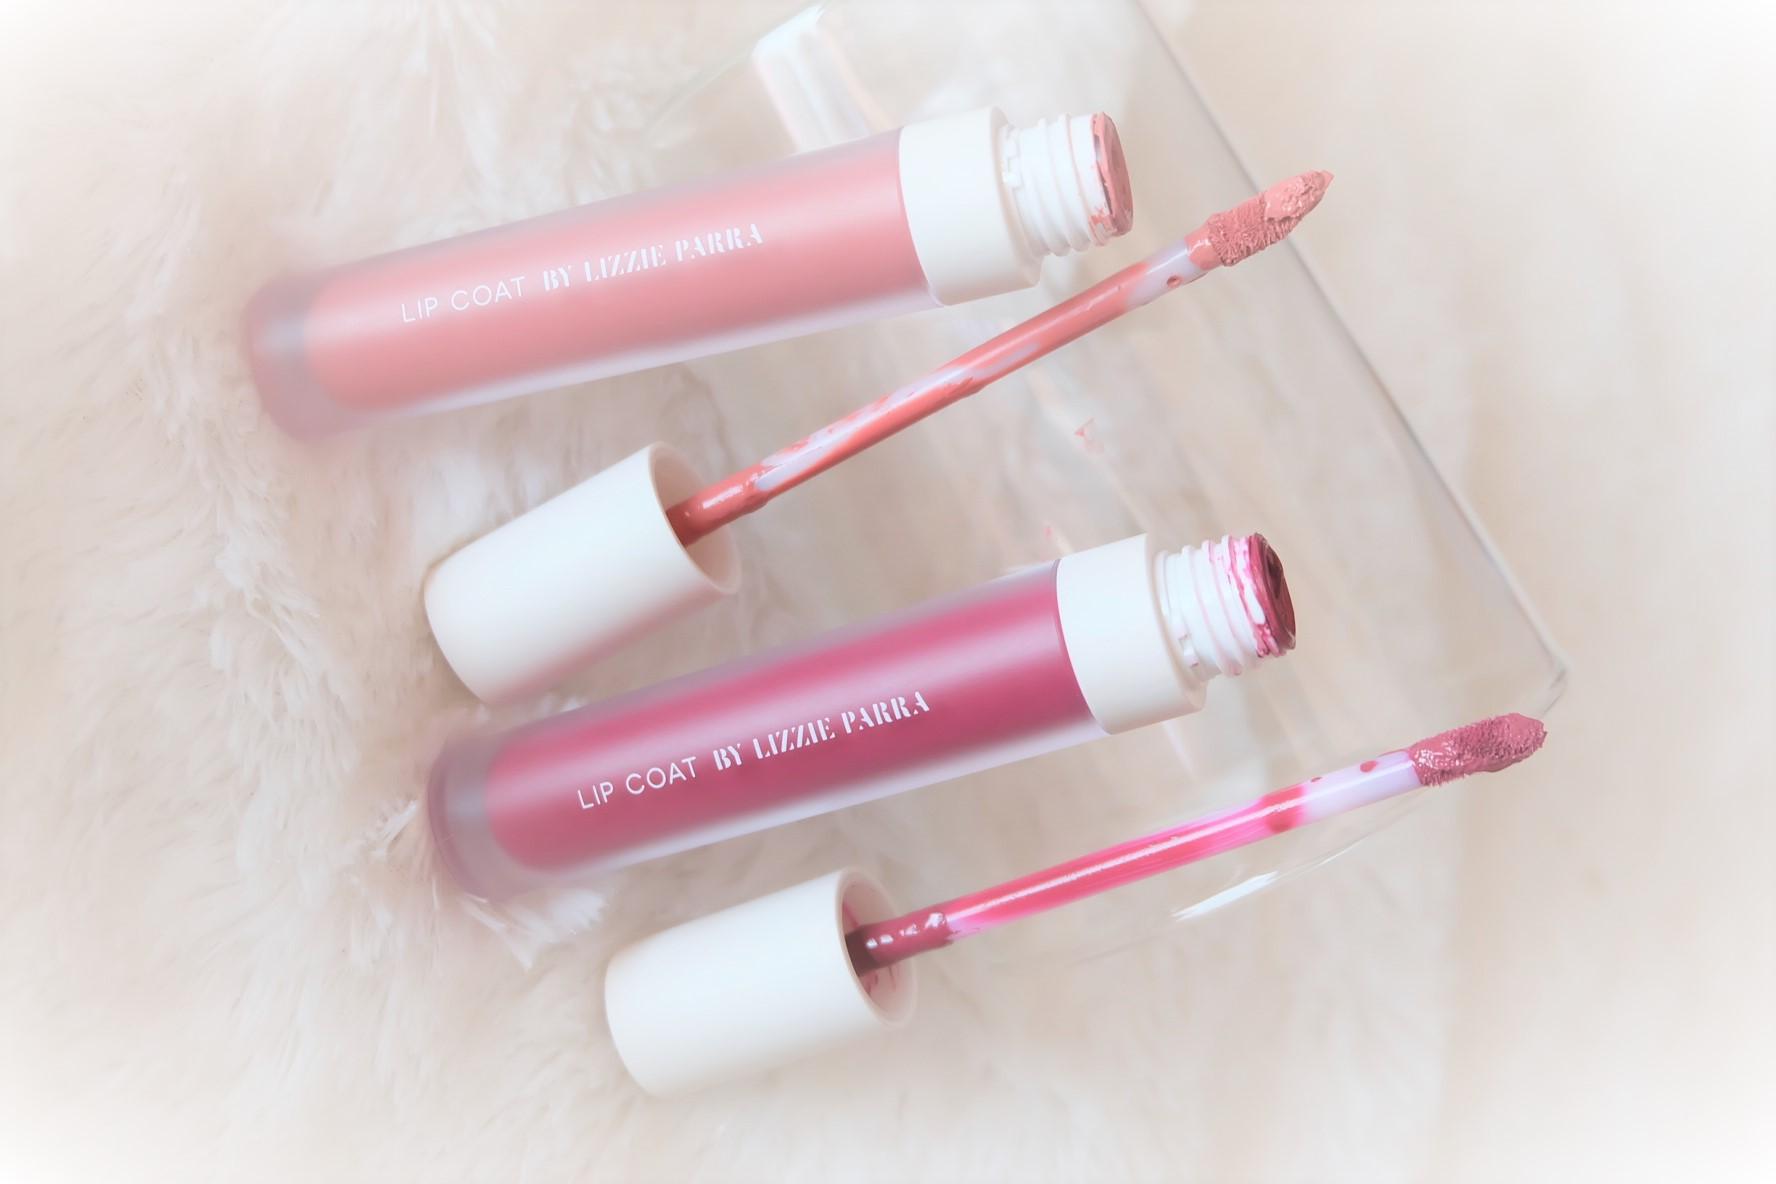 [Review] Ombre Kit Lip Coat By Lizzie Parra (Peppermint Pink x Beet Me)